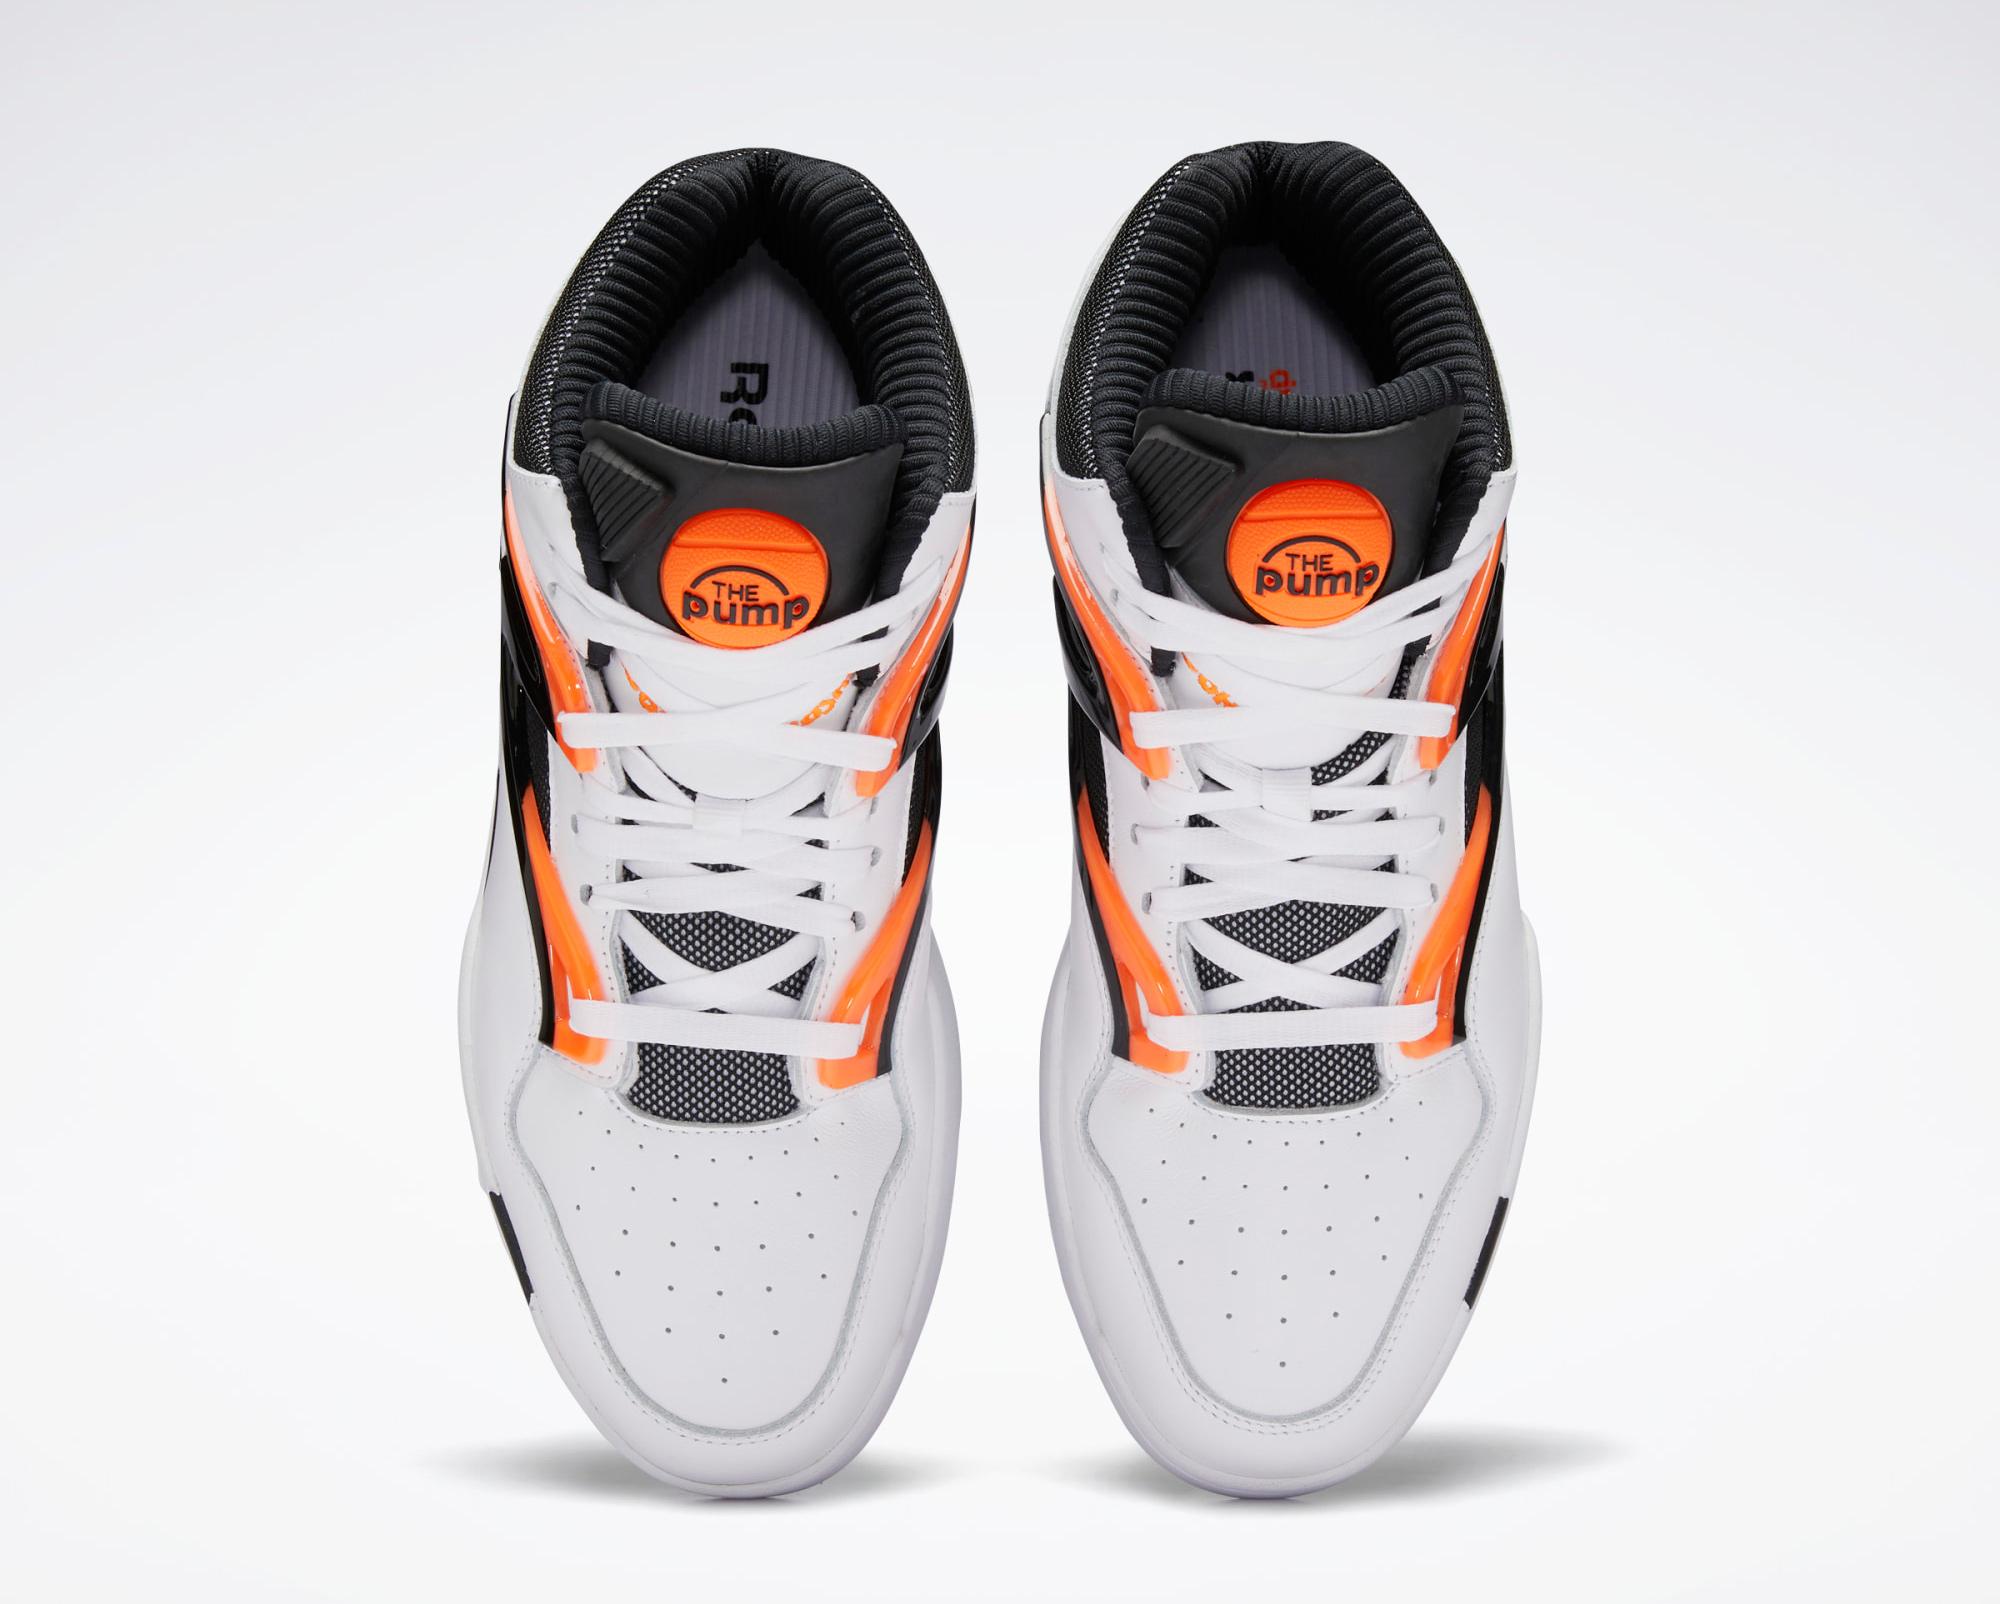 reebok-pump-omni-zone-2021-white-black-orange-3